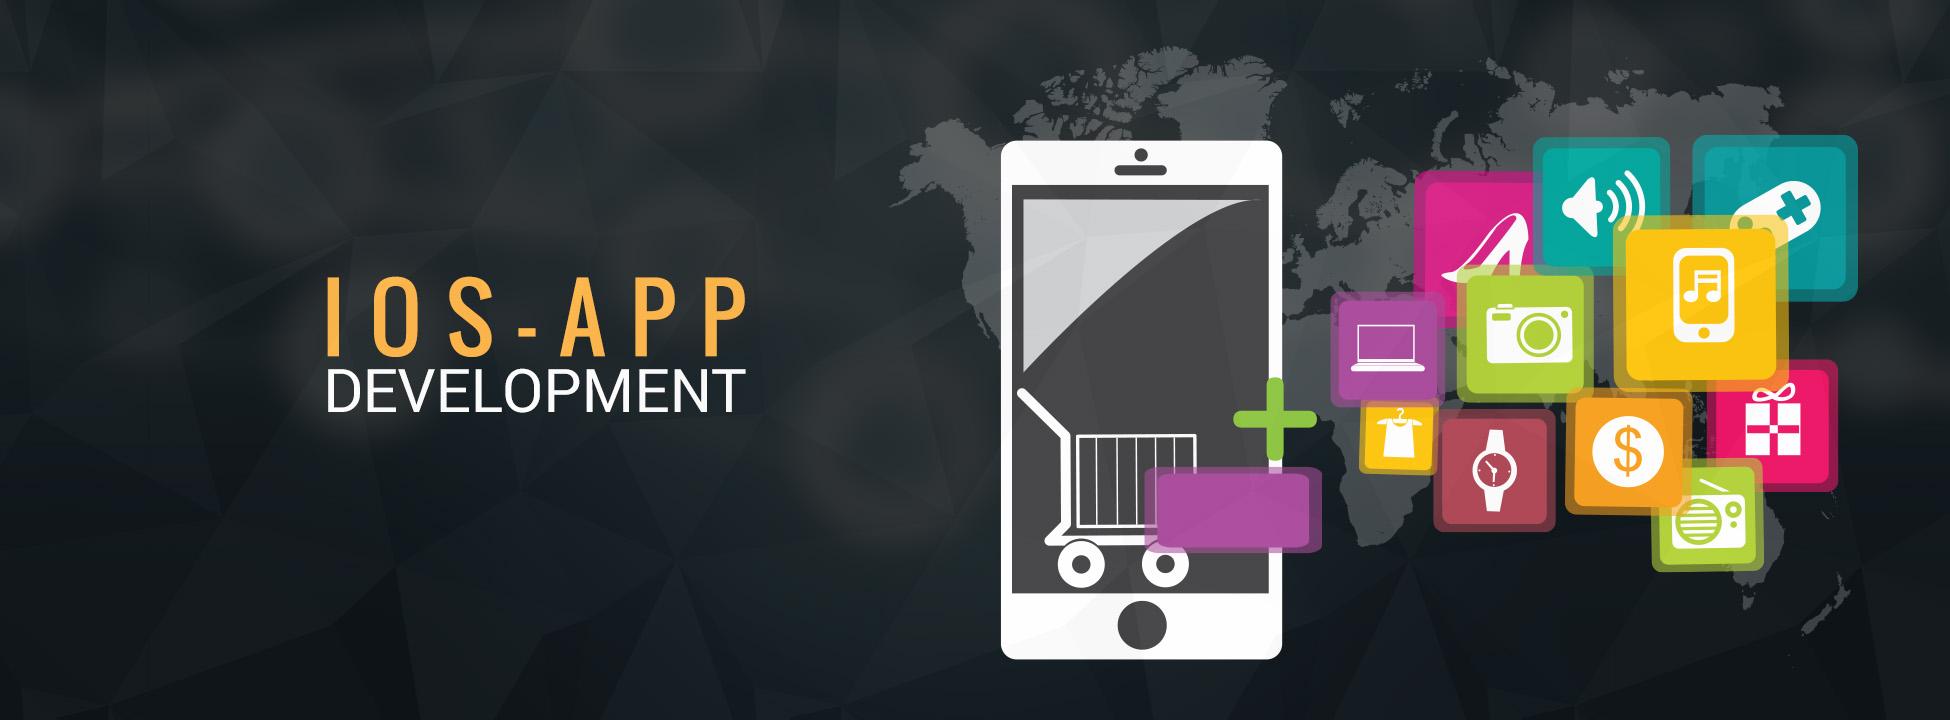 IOS app development: where to start 30